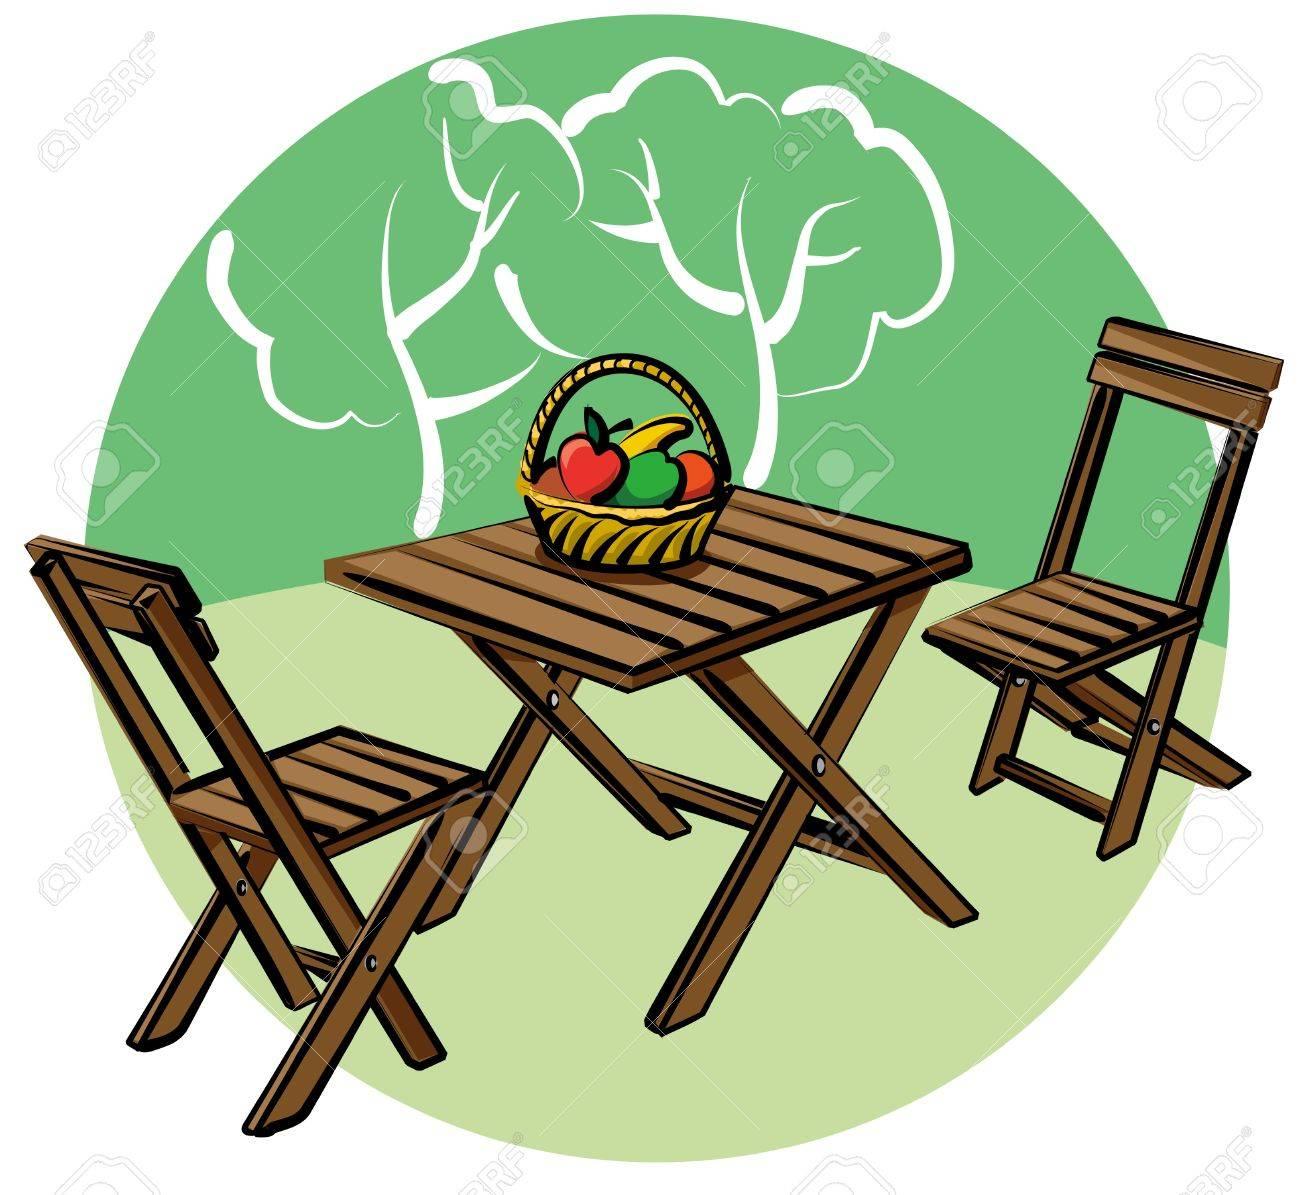 garden furniture Stock Vector - 9945928